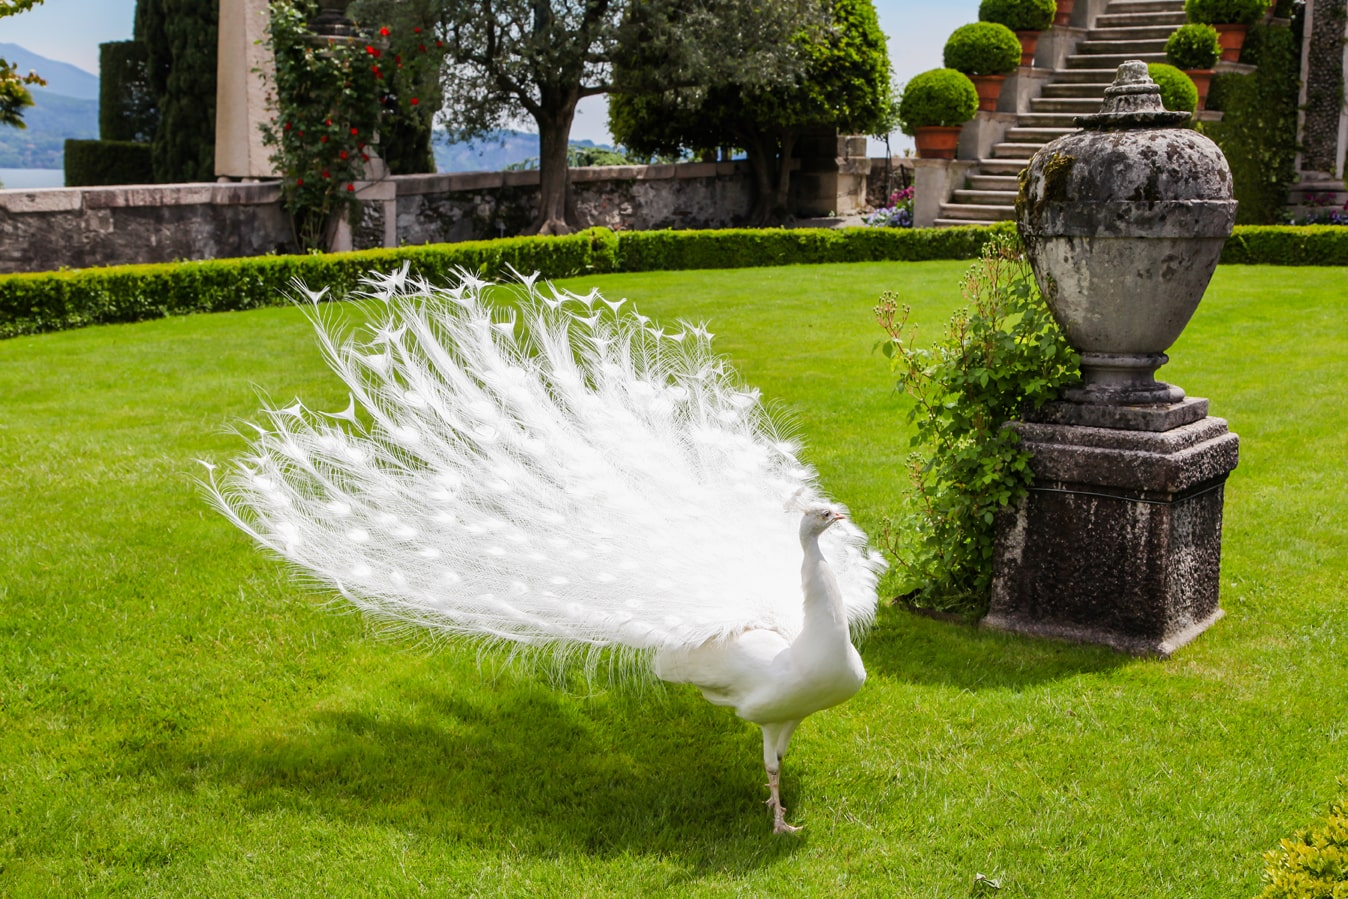 павлин, белый павлин, павлин на острове боромео